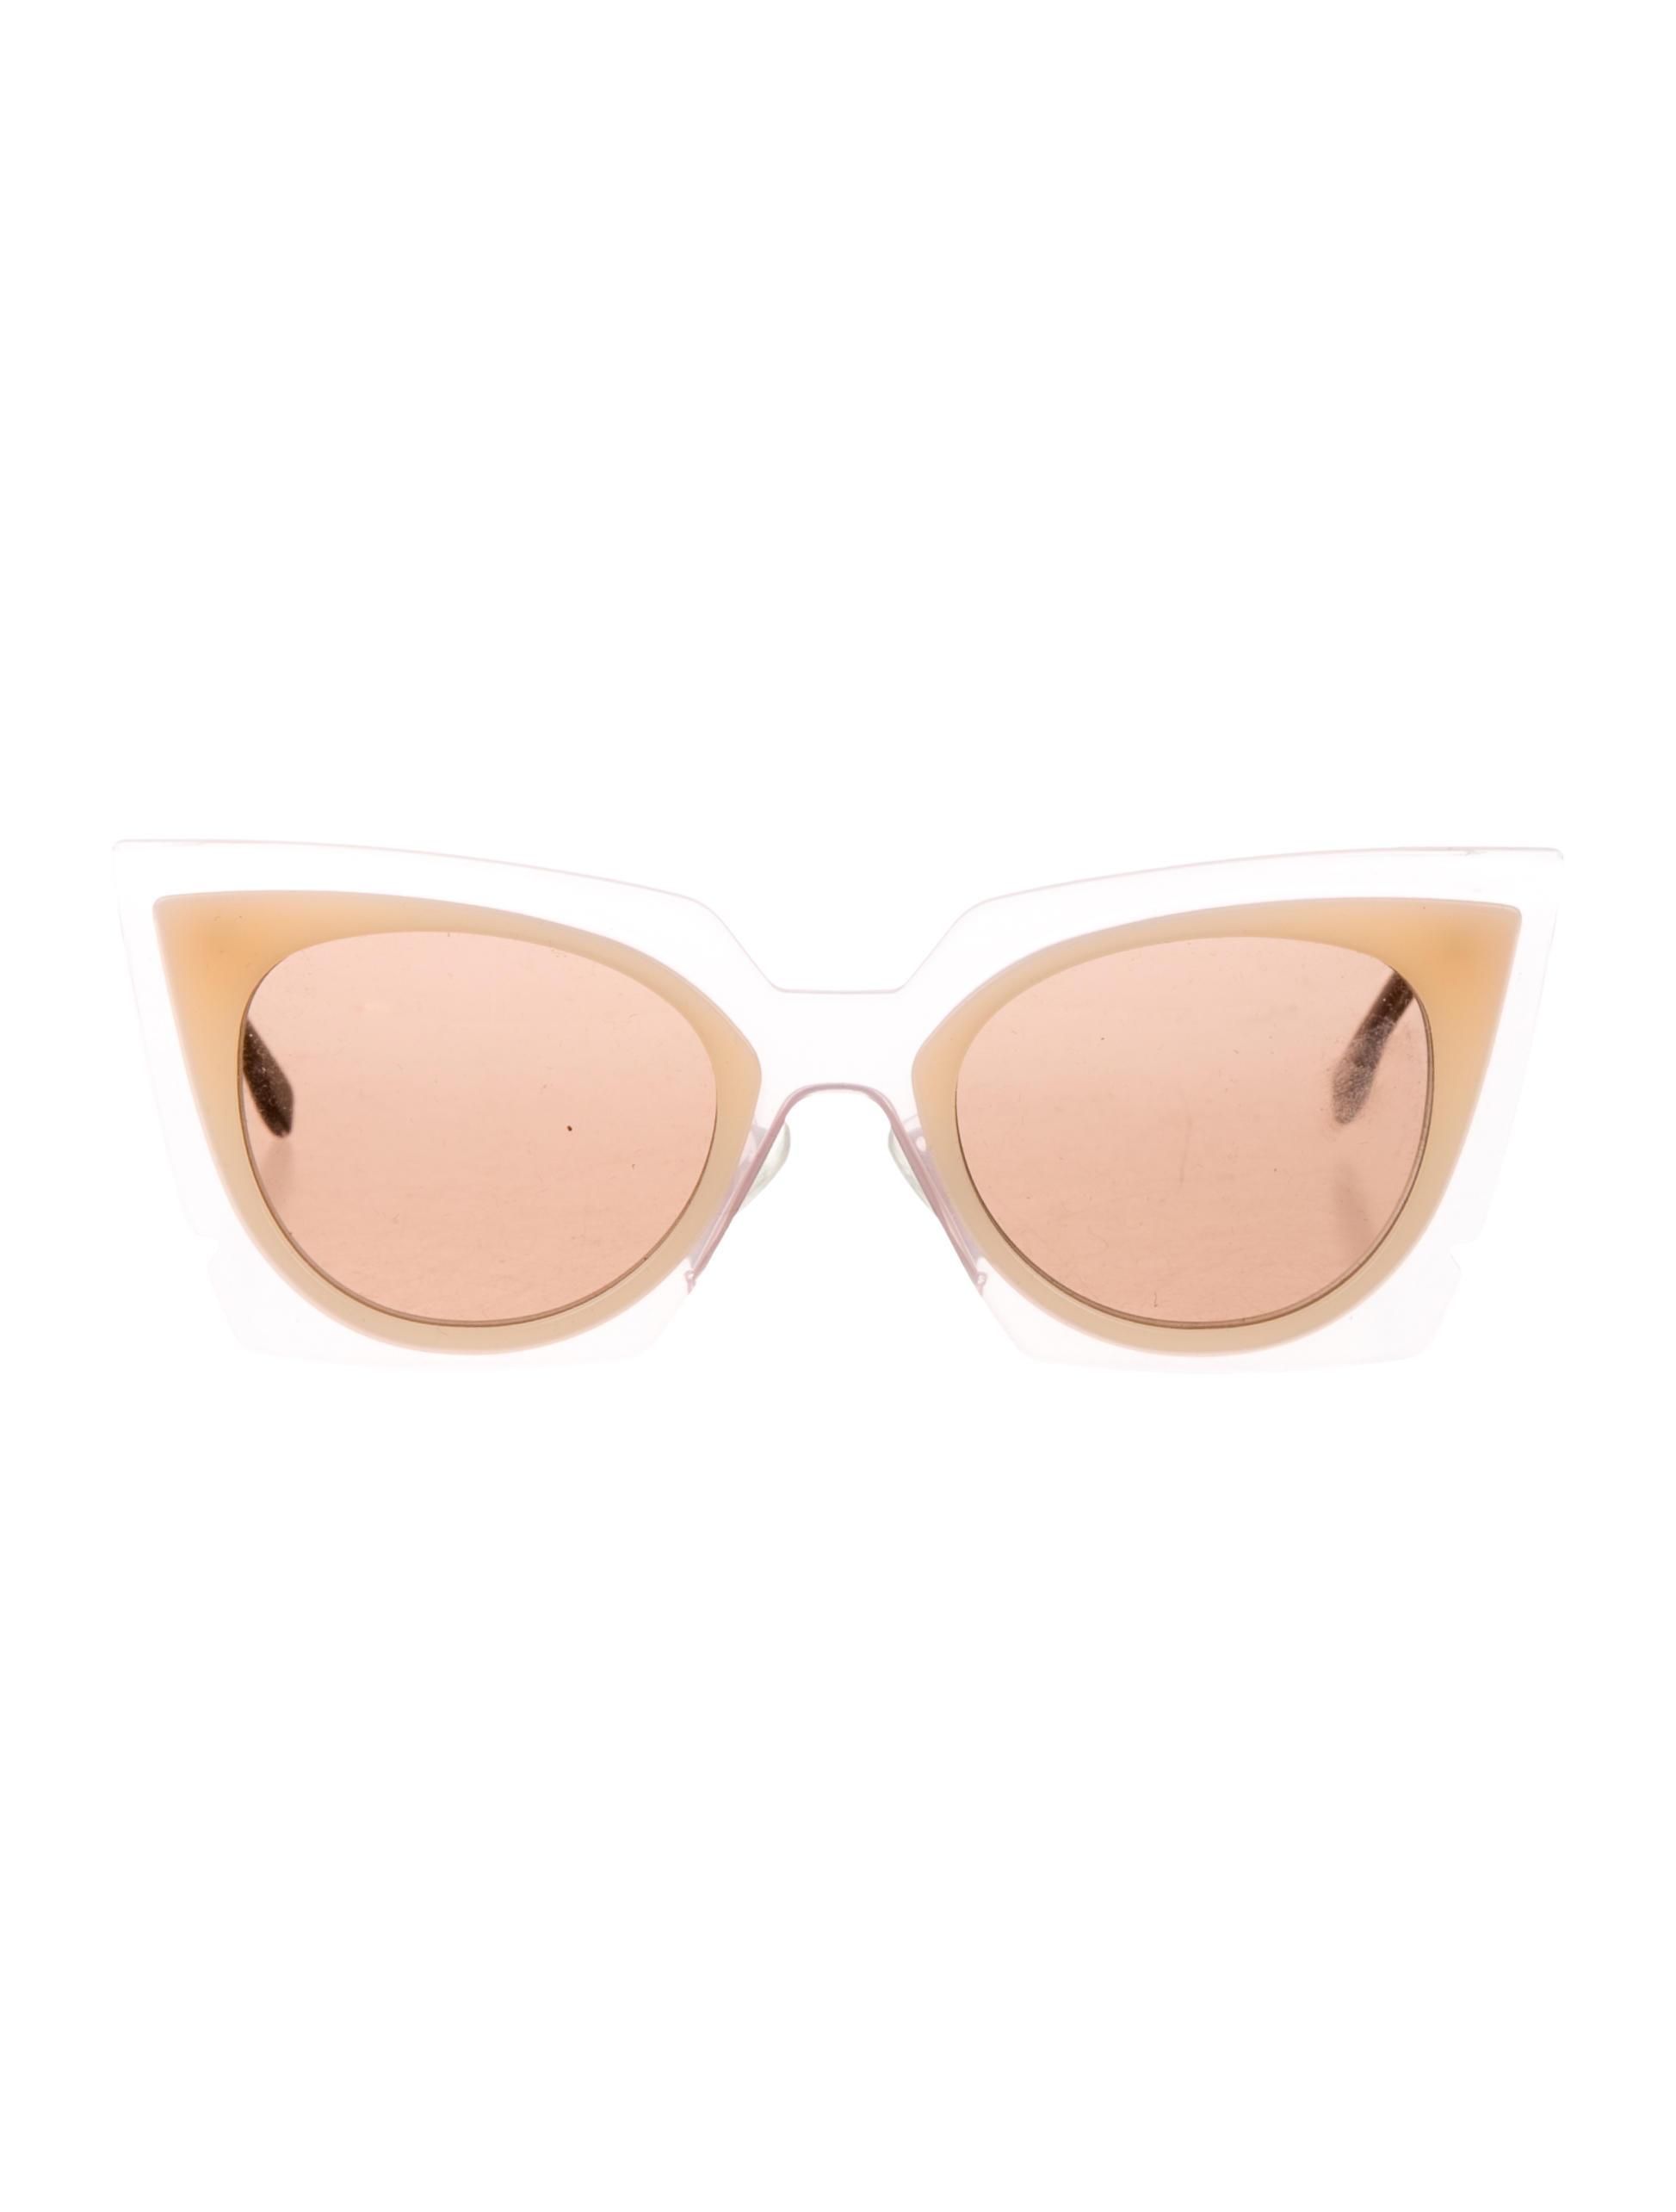 Geometric Tinted Sunglasses